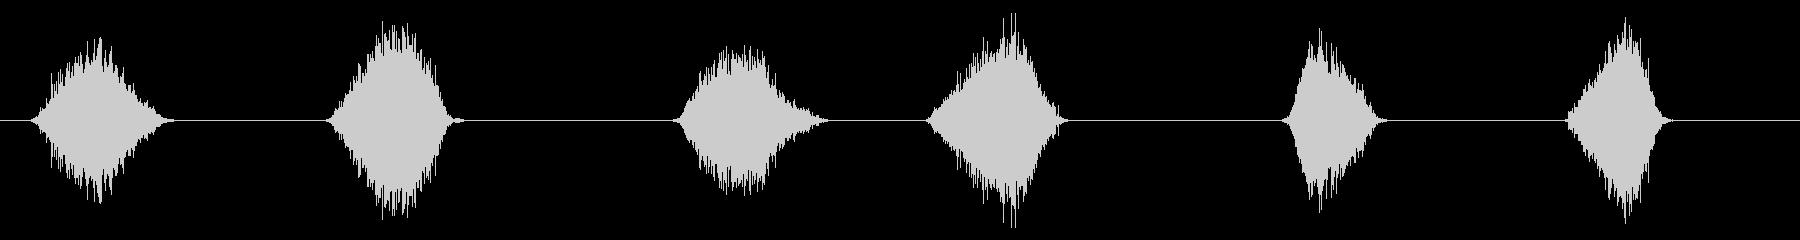 PC マウス ムーブ03-08(ソフト)の未再生の波形